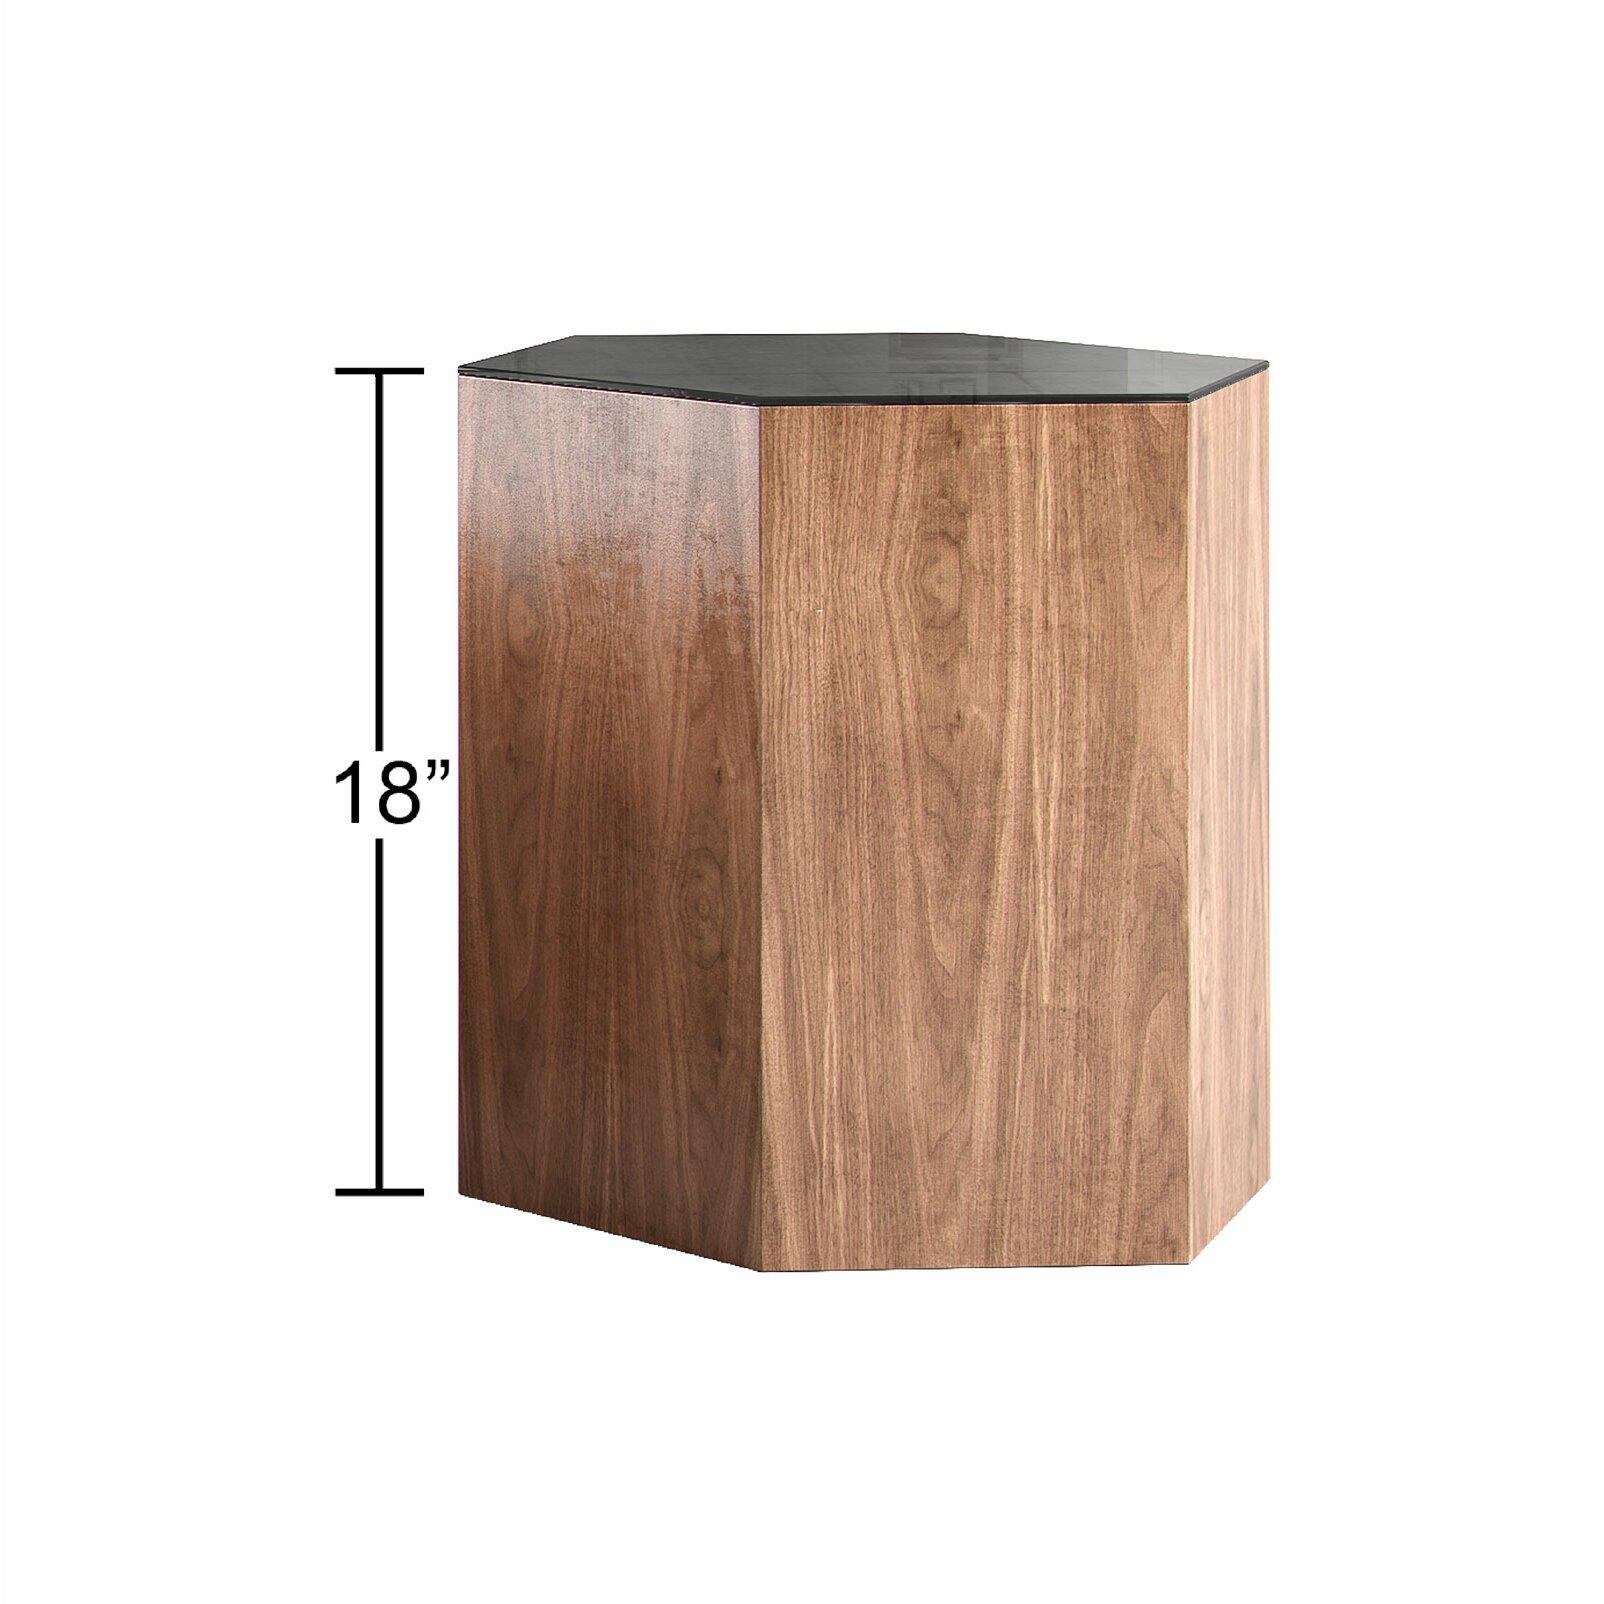 Modloft Centre Coffee Table Reviews Wayfair